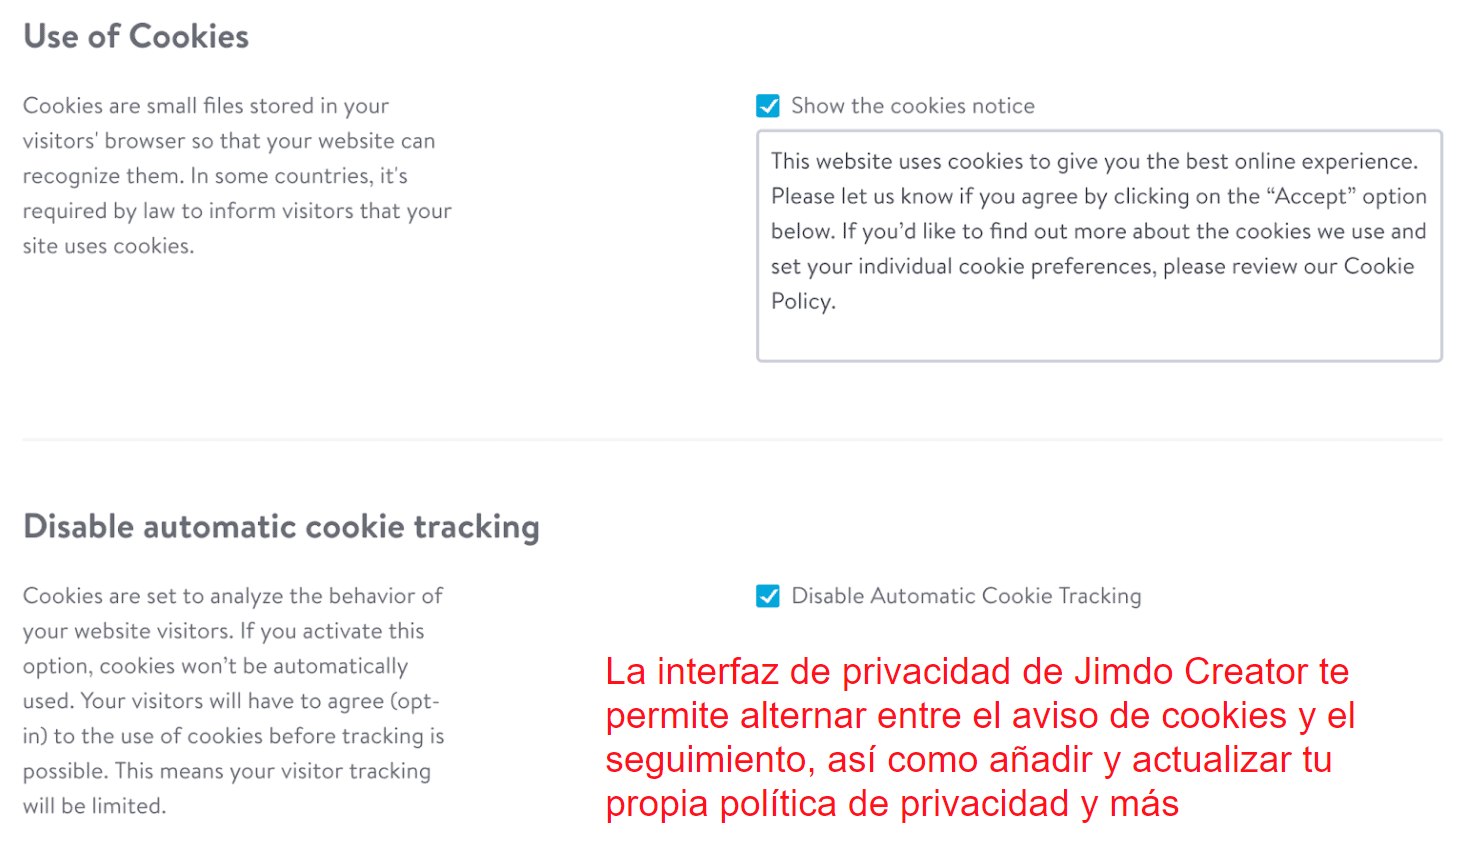 Privacy policy interface - Jimdo Creator